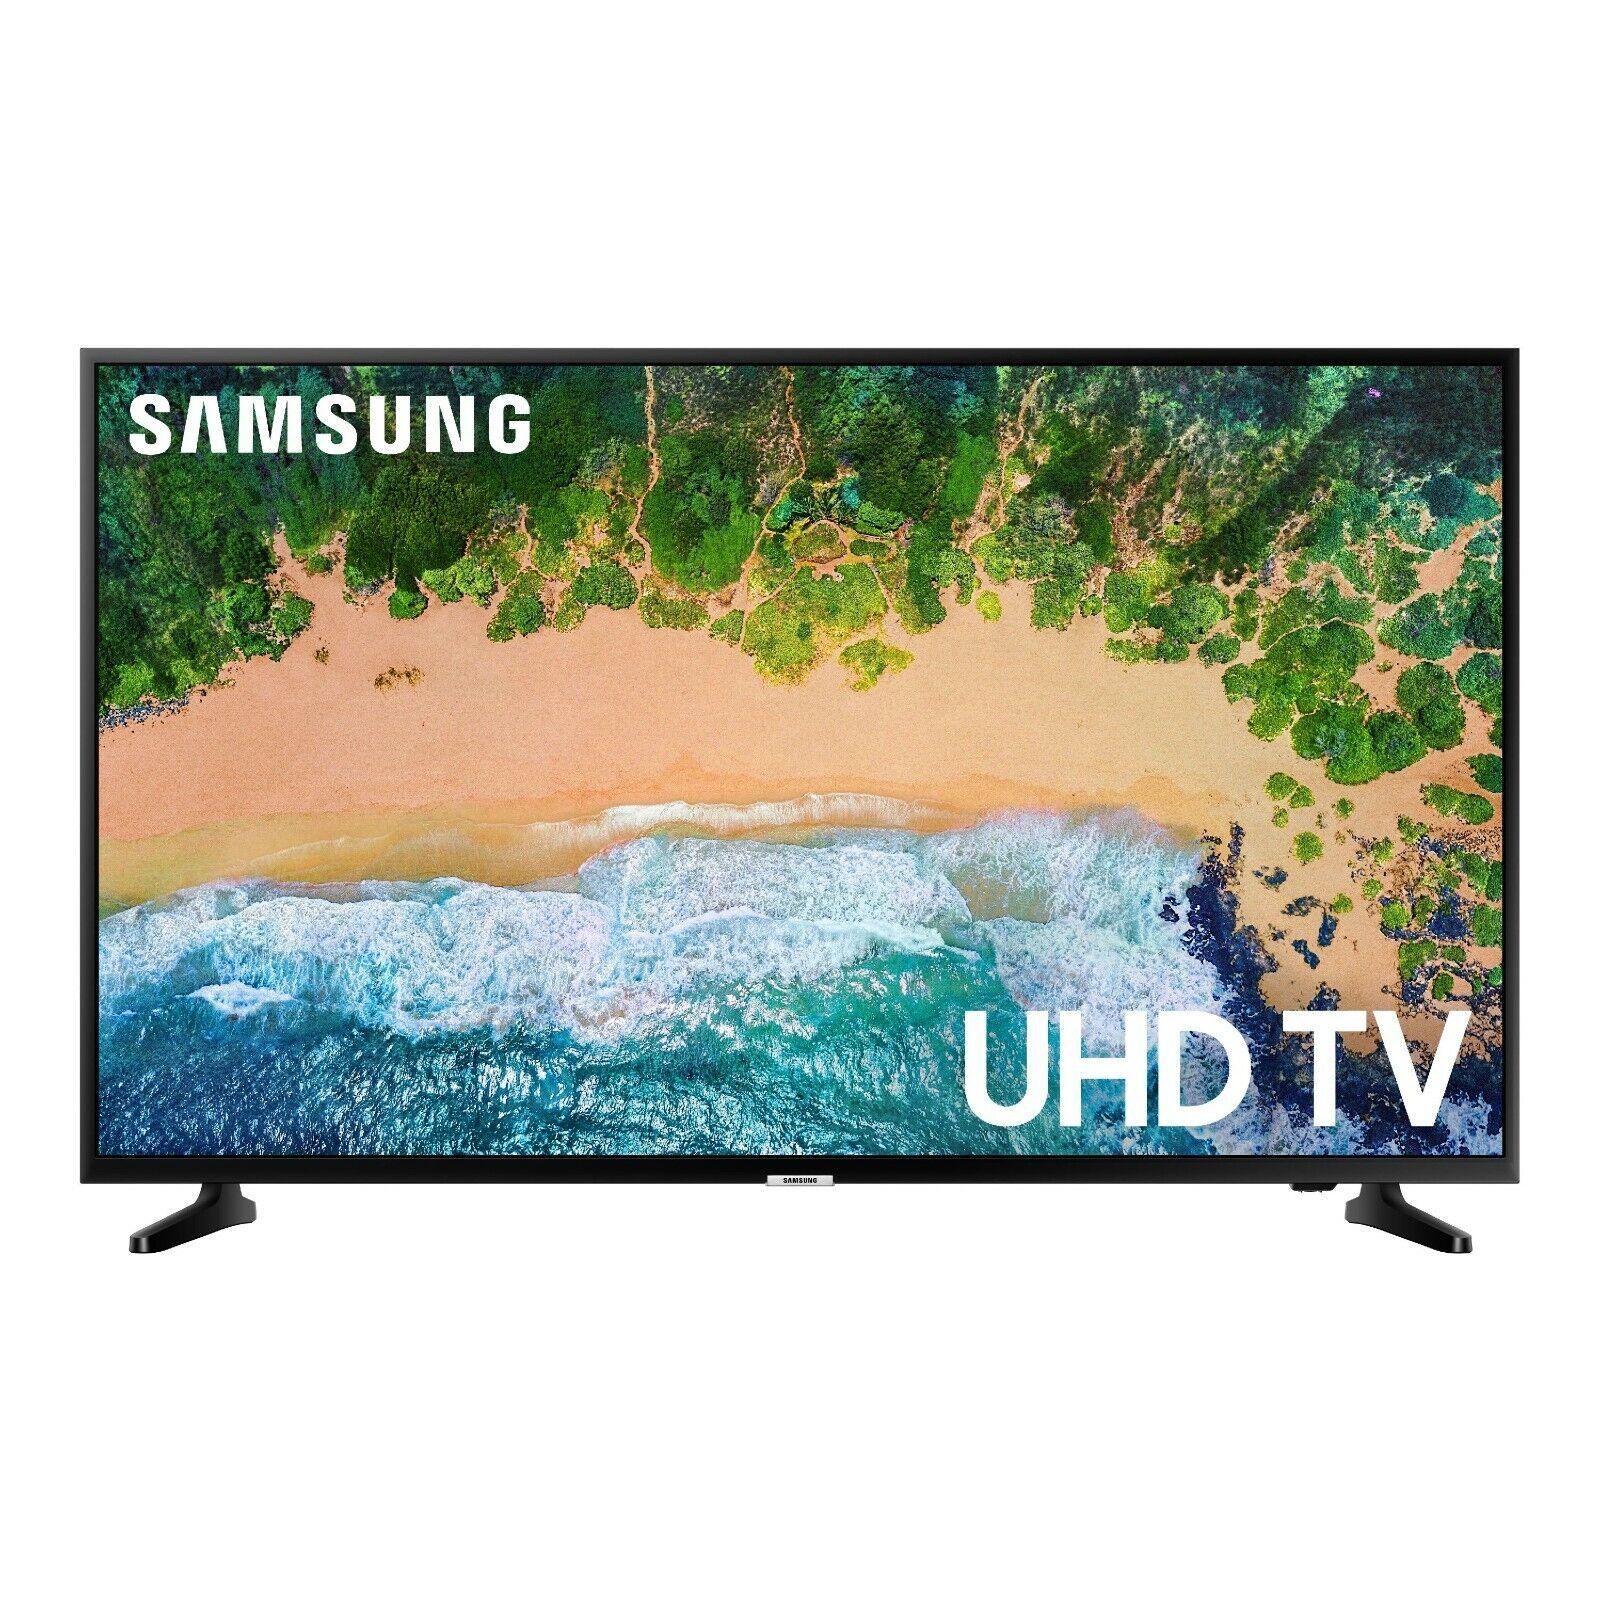 Samsung 50 inch 4K Smart LED HDR TV - Glossy Black Brand New